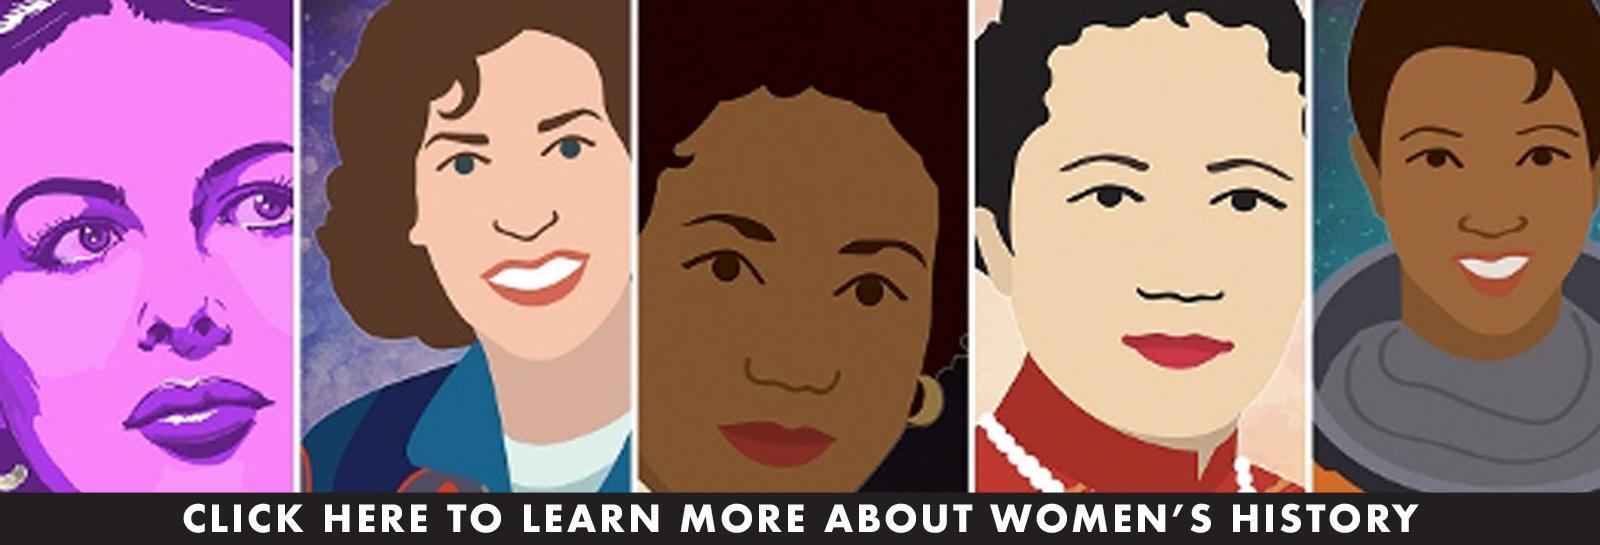 women history month banner